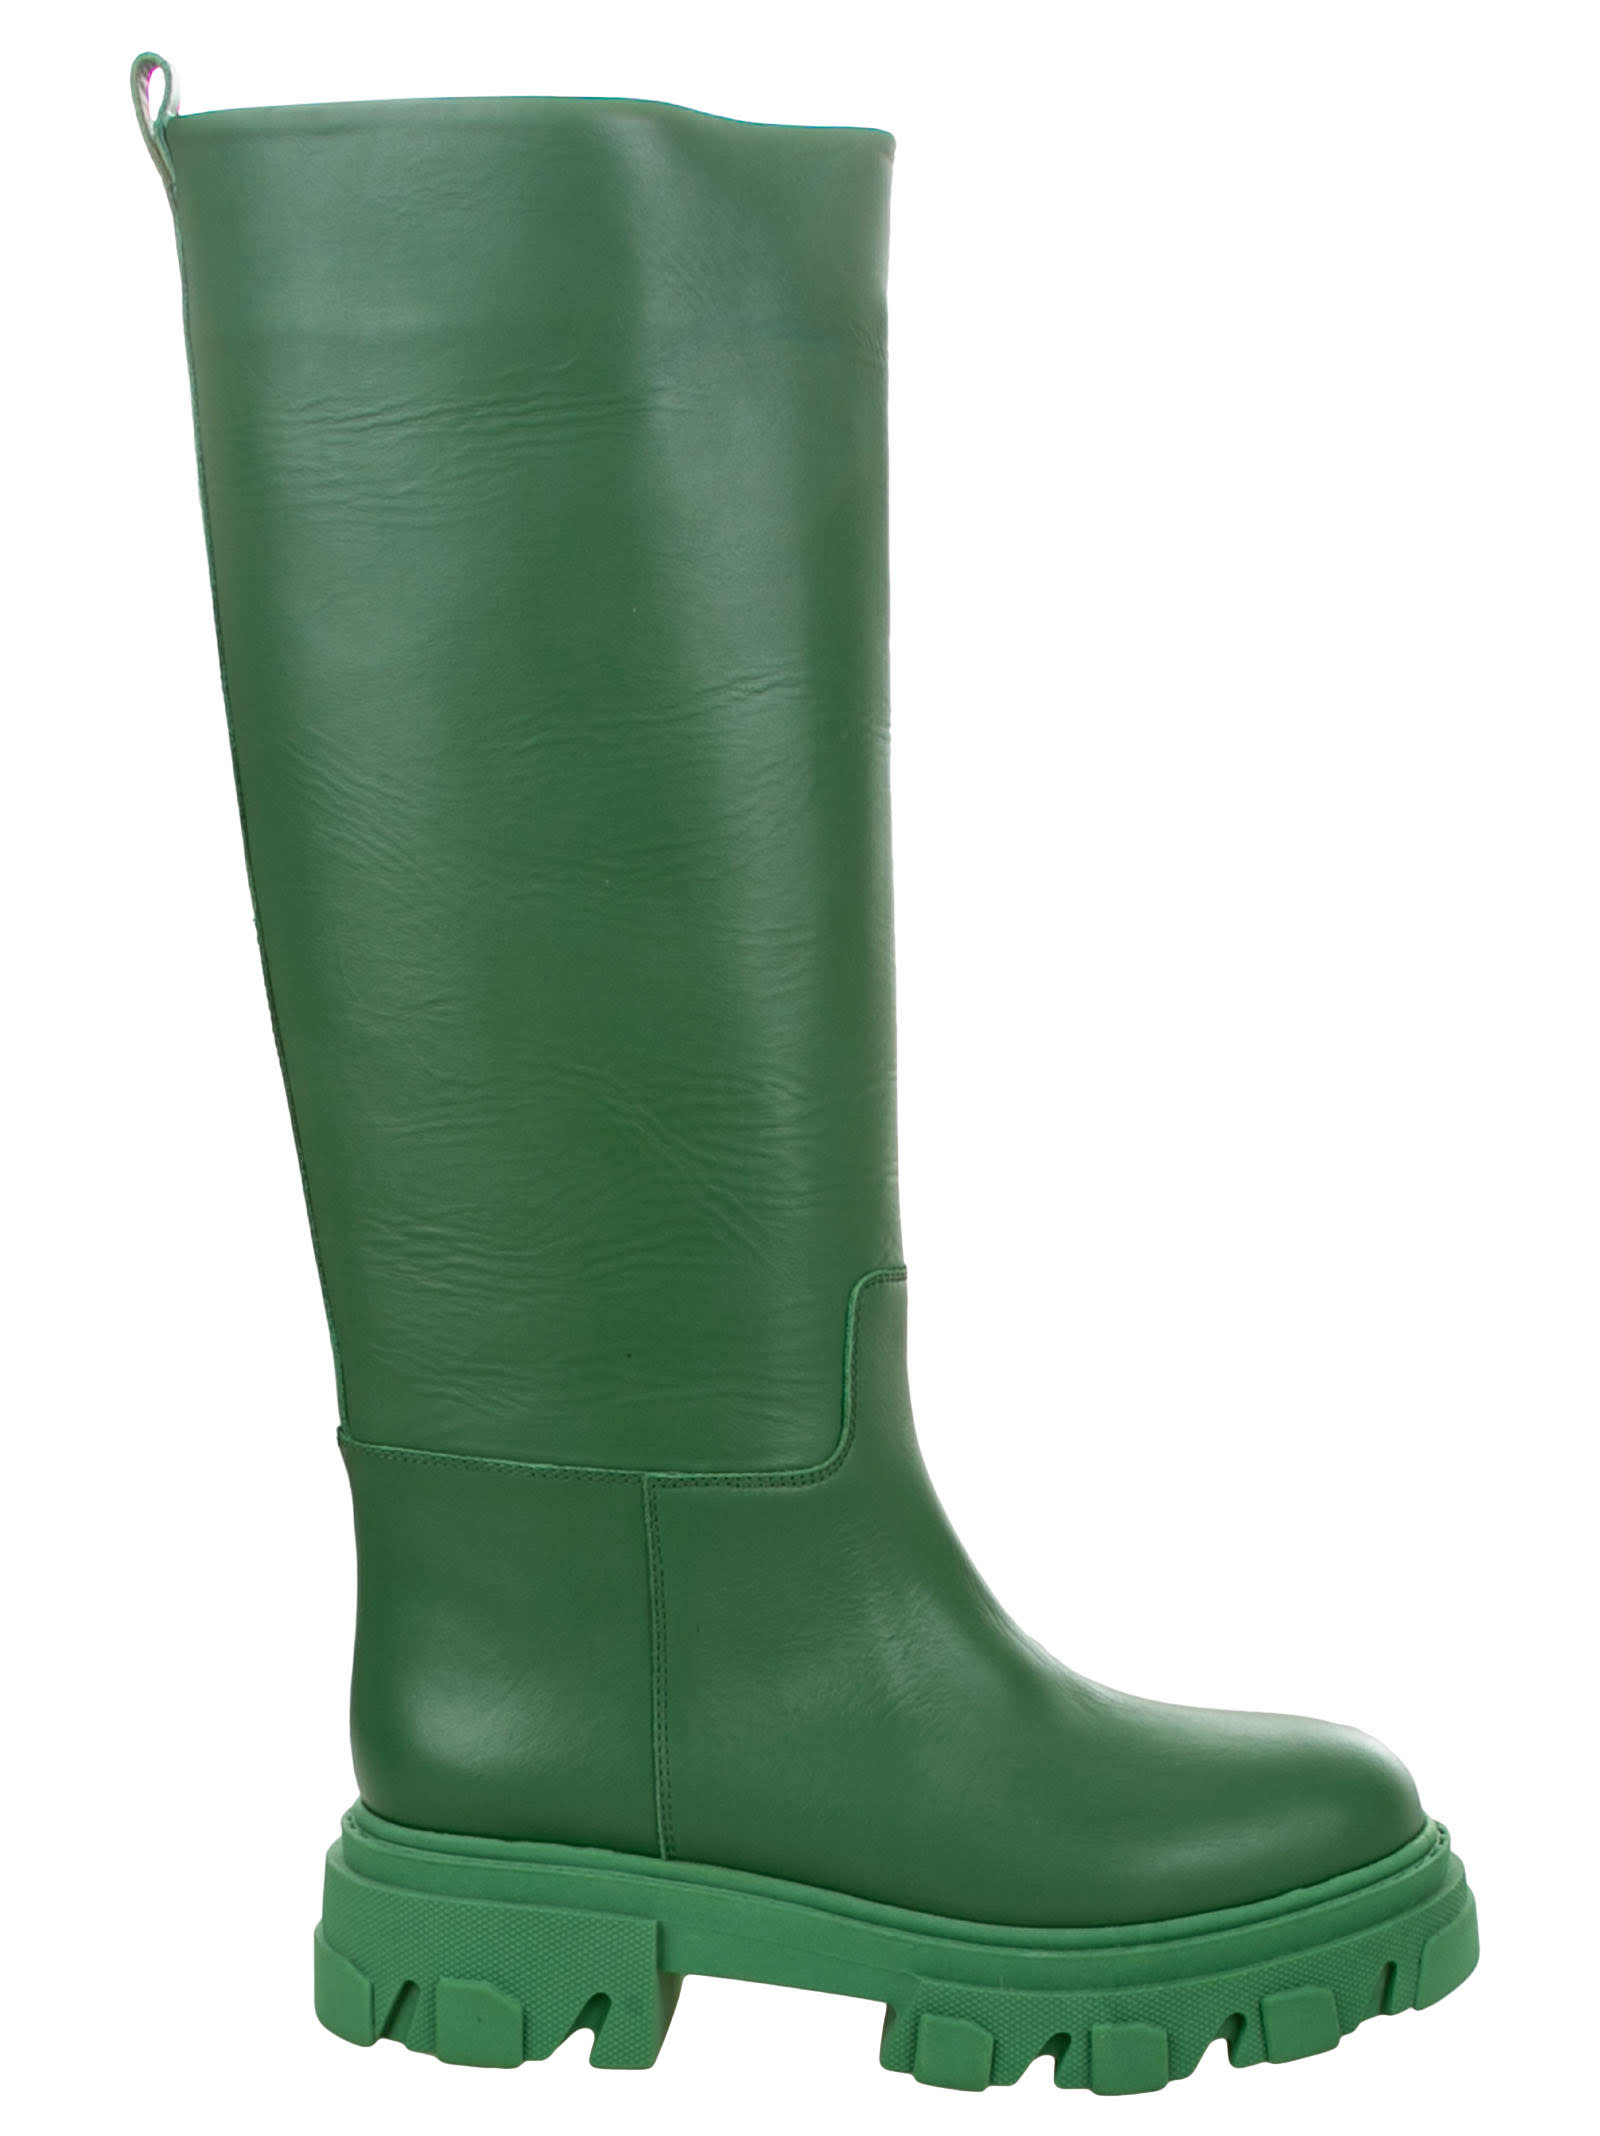 Perni Rain Boots